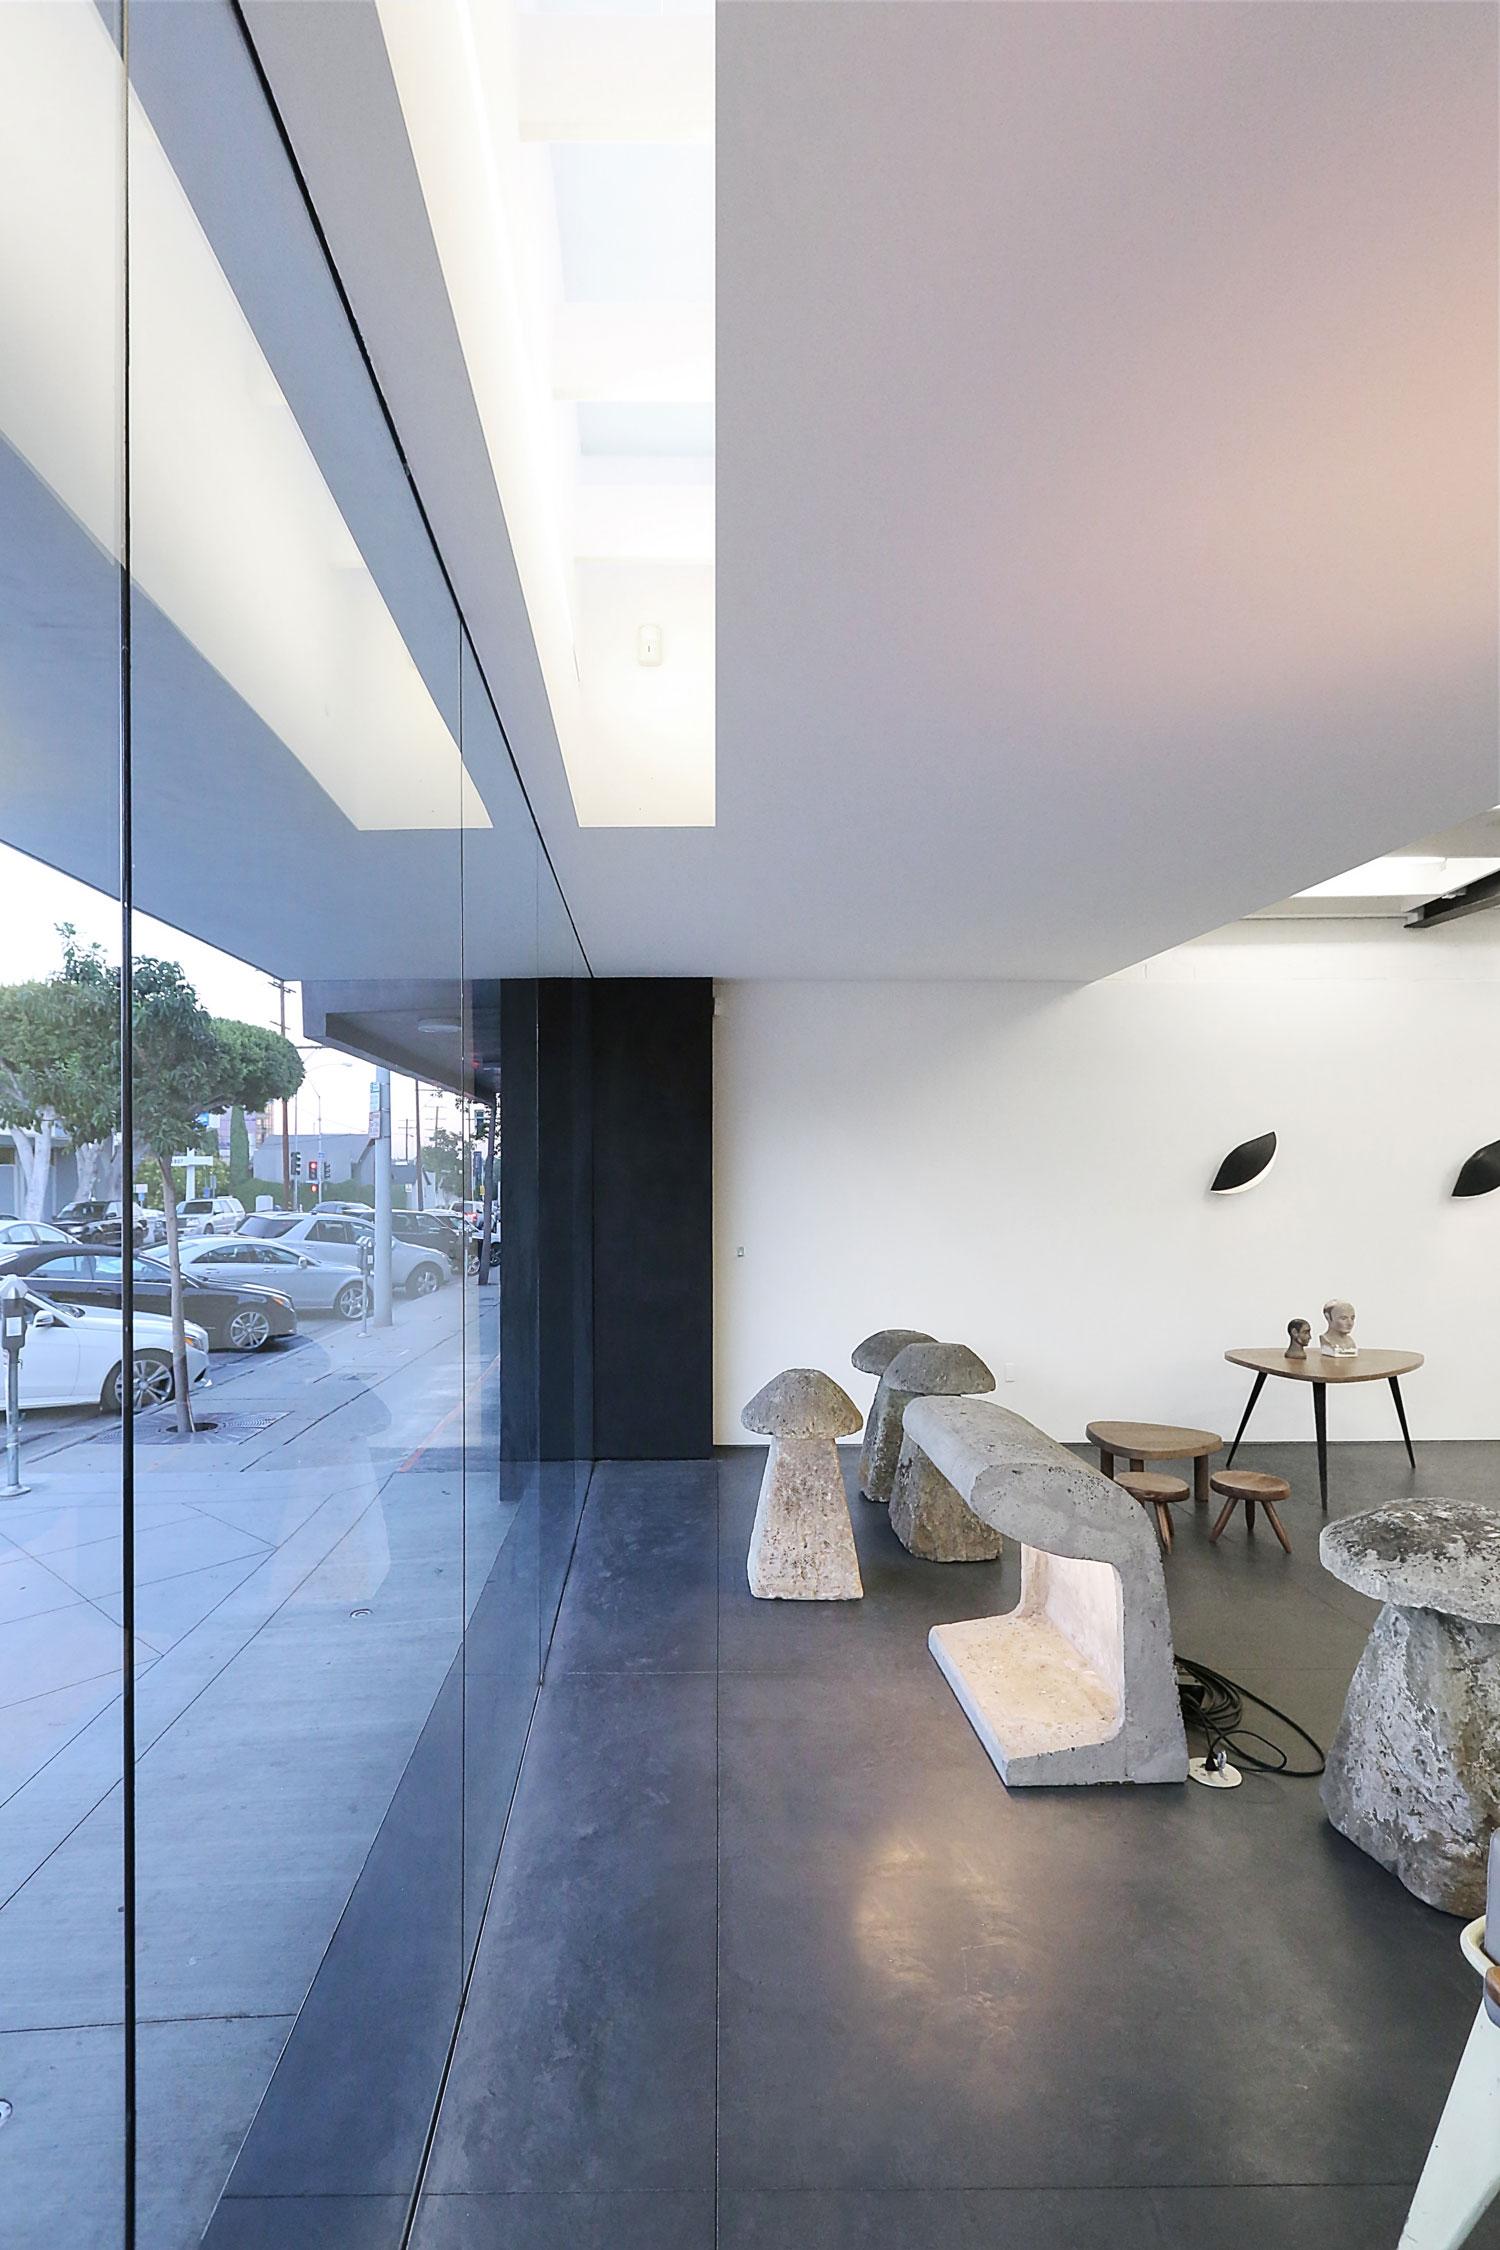 Maxfield Gallery